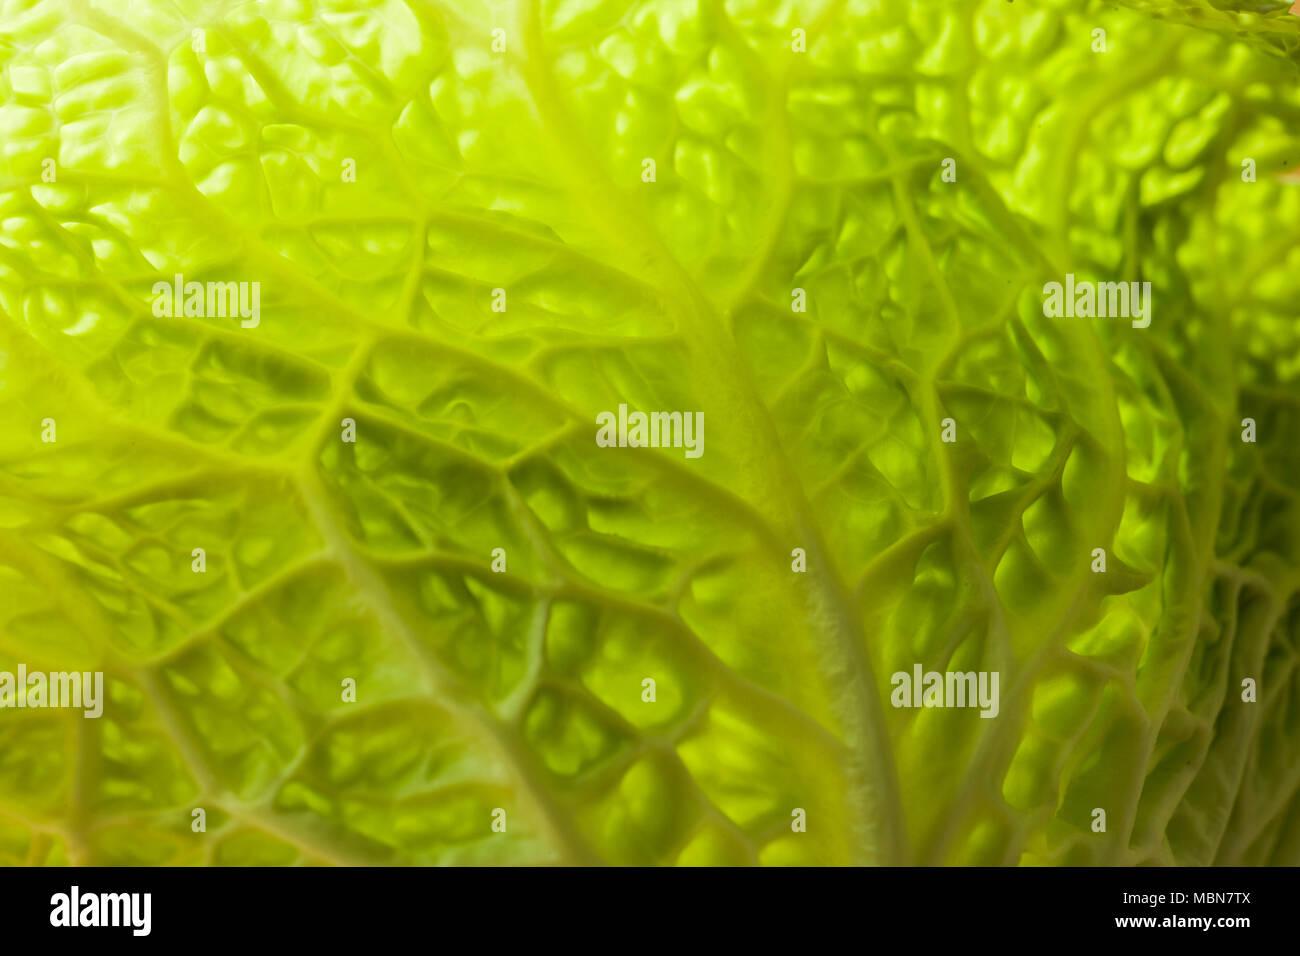 Studio still life closeup of a white cabbage. - Stock Image